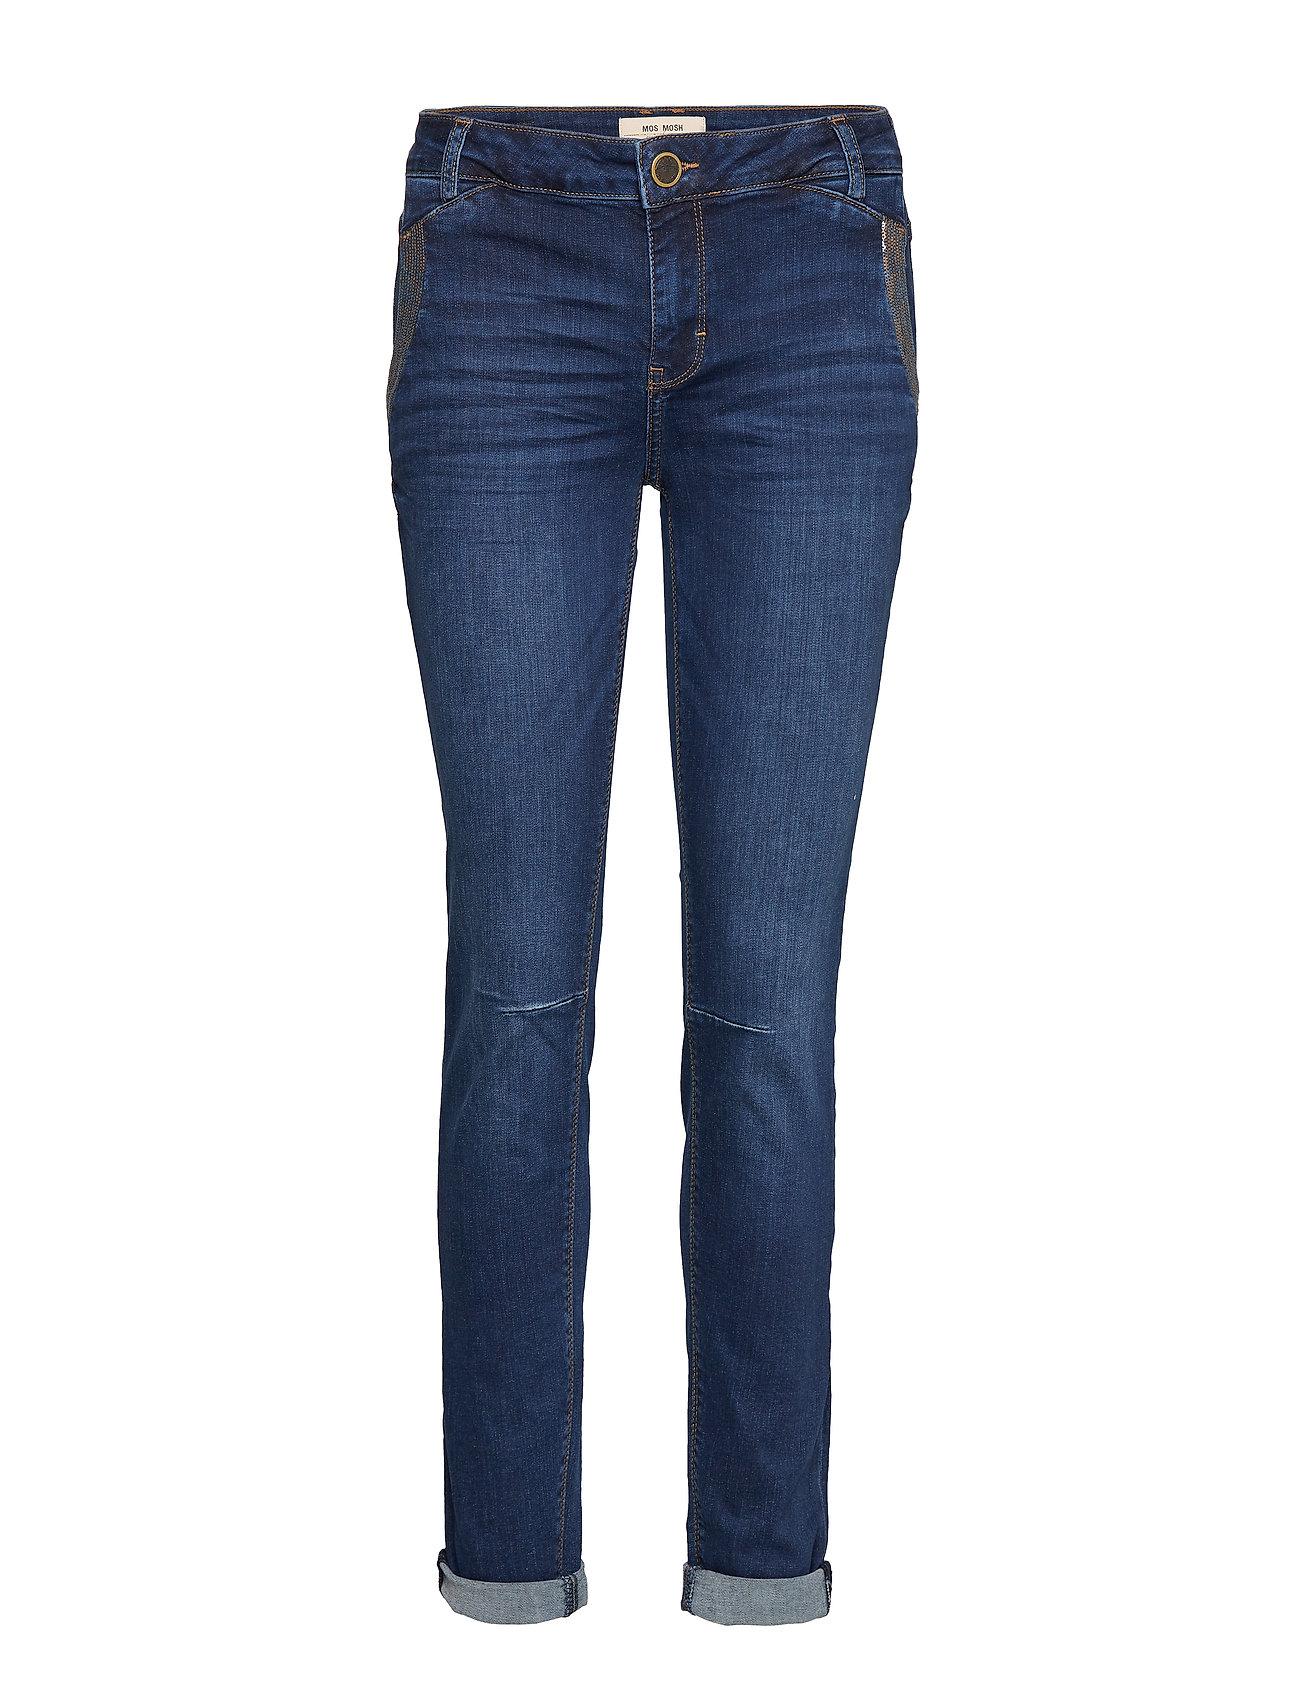 MOS MOSH Etta Reef Jeans - BLUE DENIM